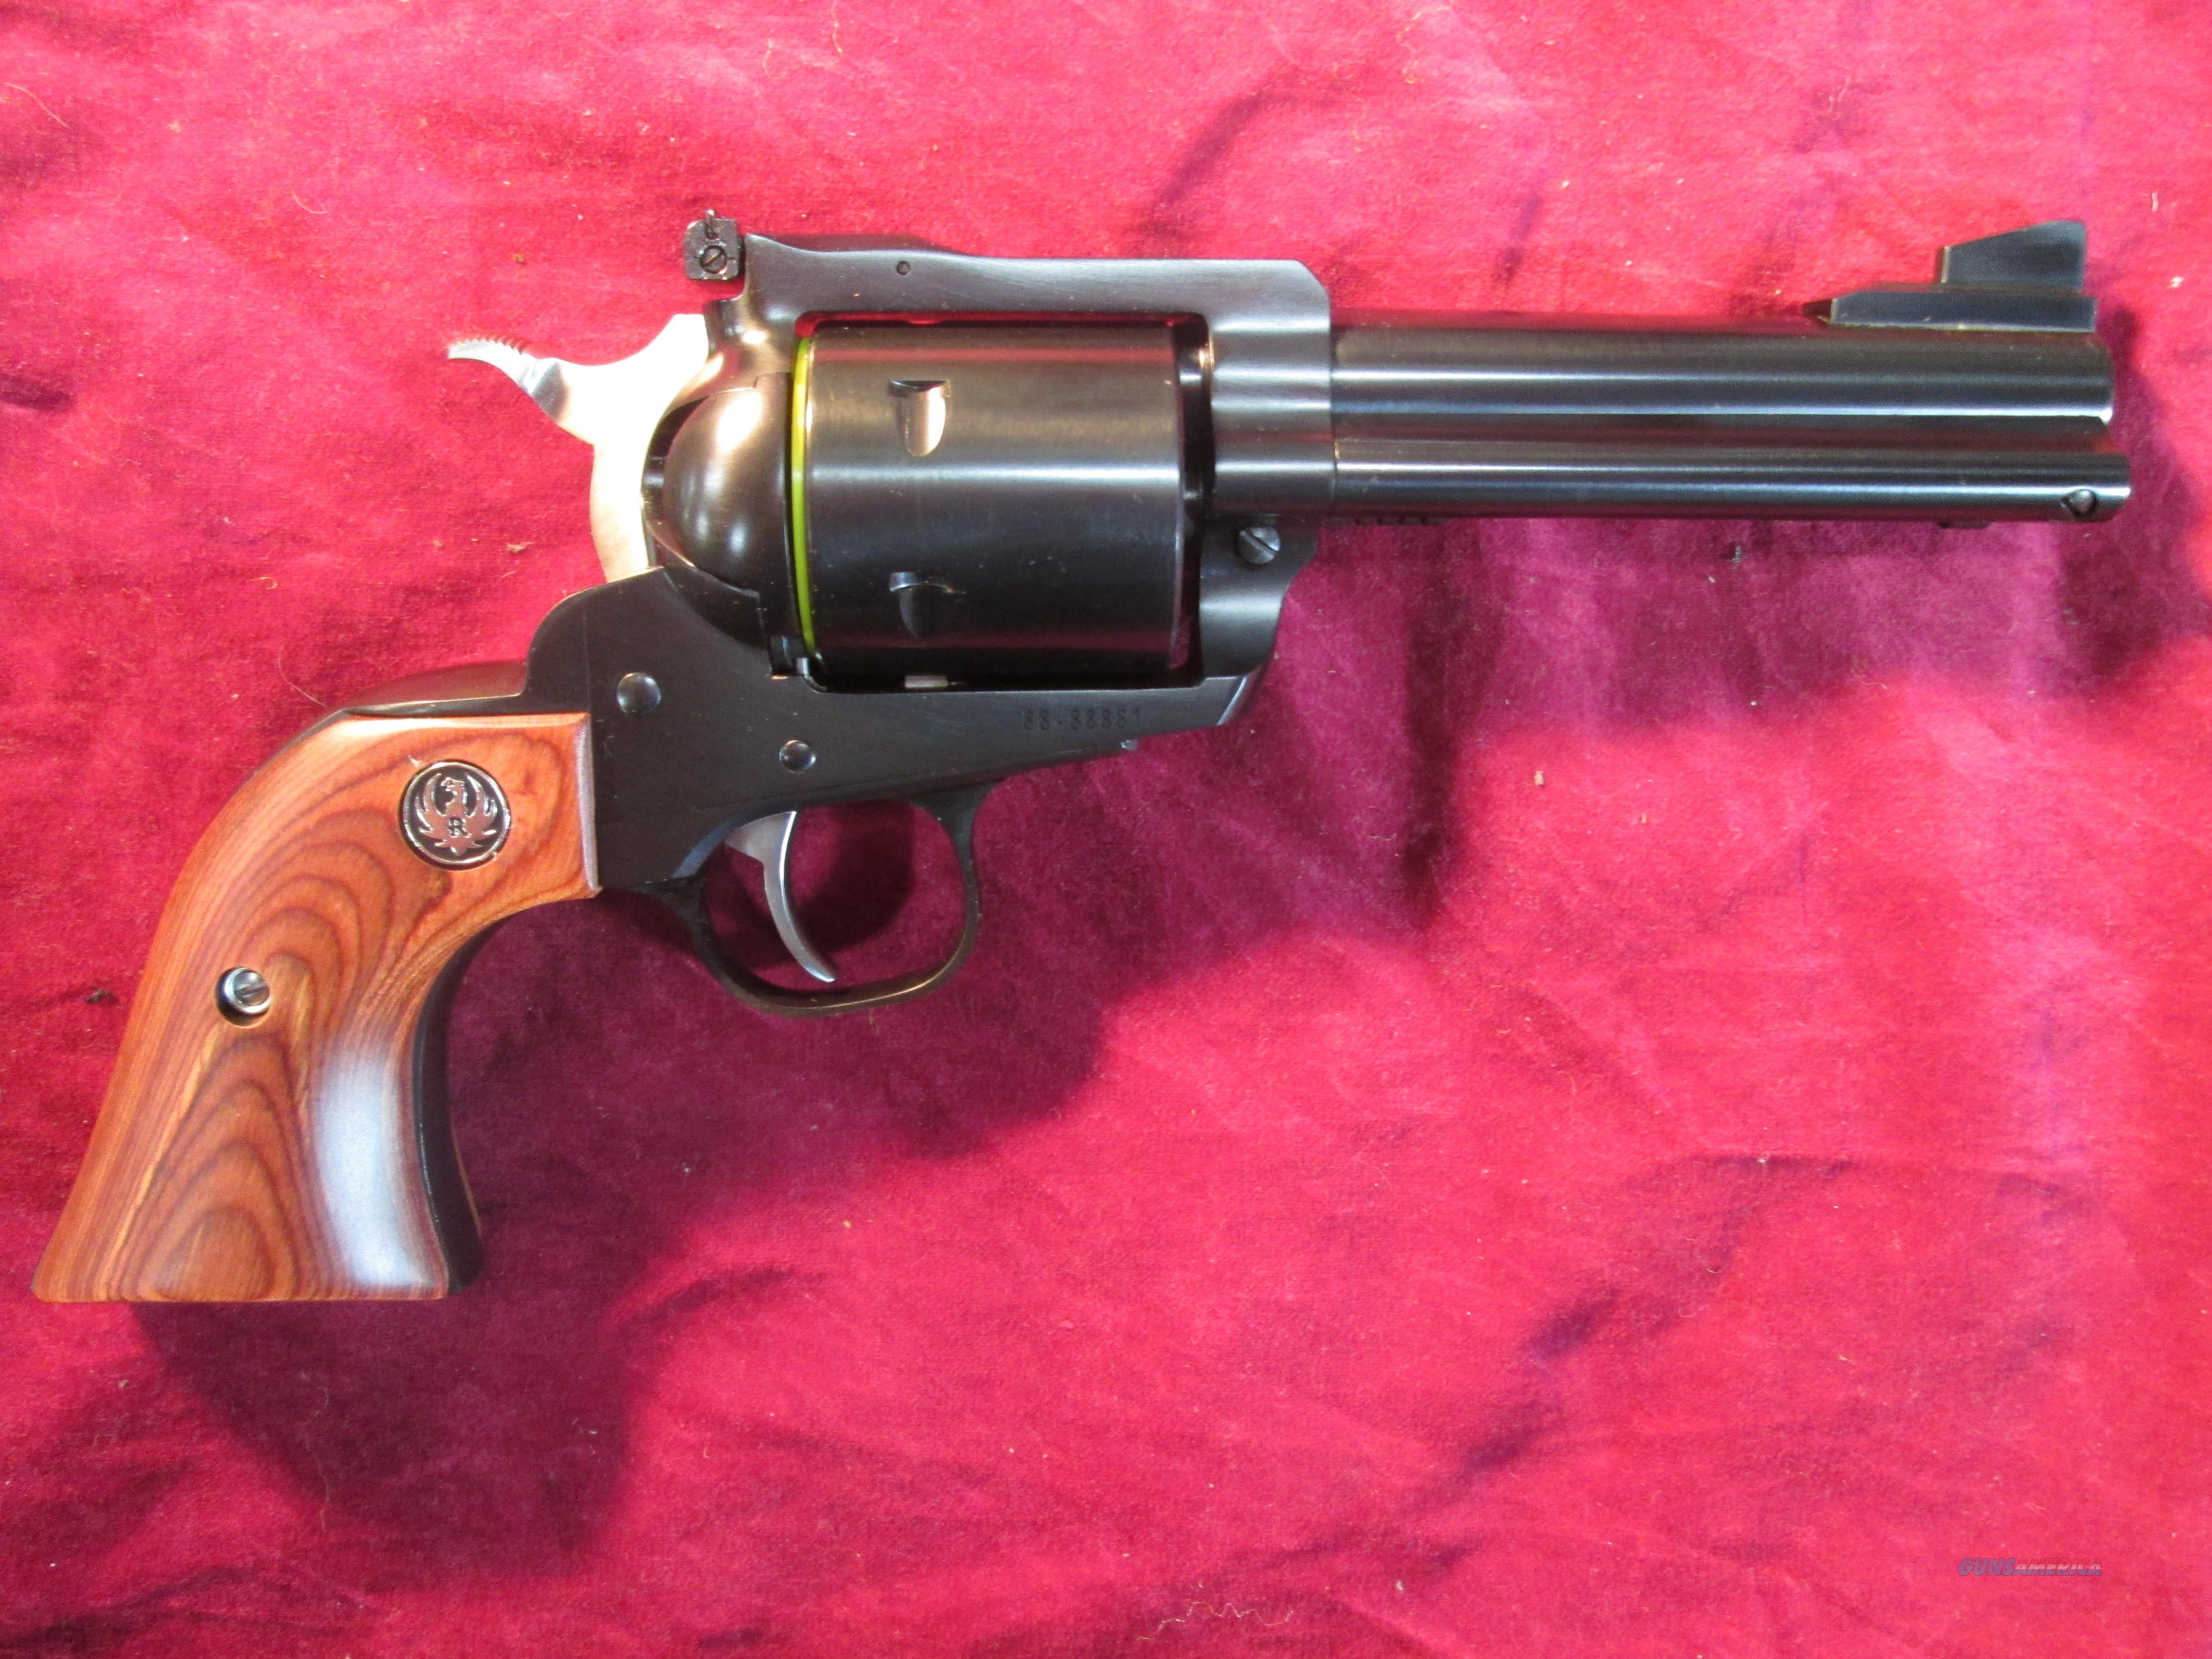 "RUGER SUPER BLACKHAWK 44MAG 4 5/8"" BLUE UNFLUTED NEW (00813)  Guns > Pistols > Ruger Single Action Revolvers > Blackhawk Type"